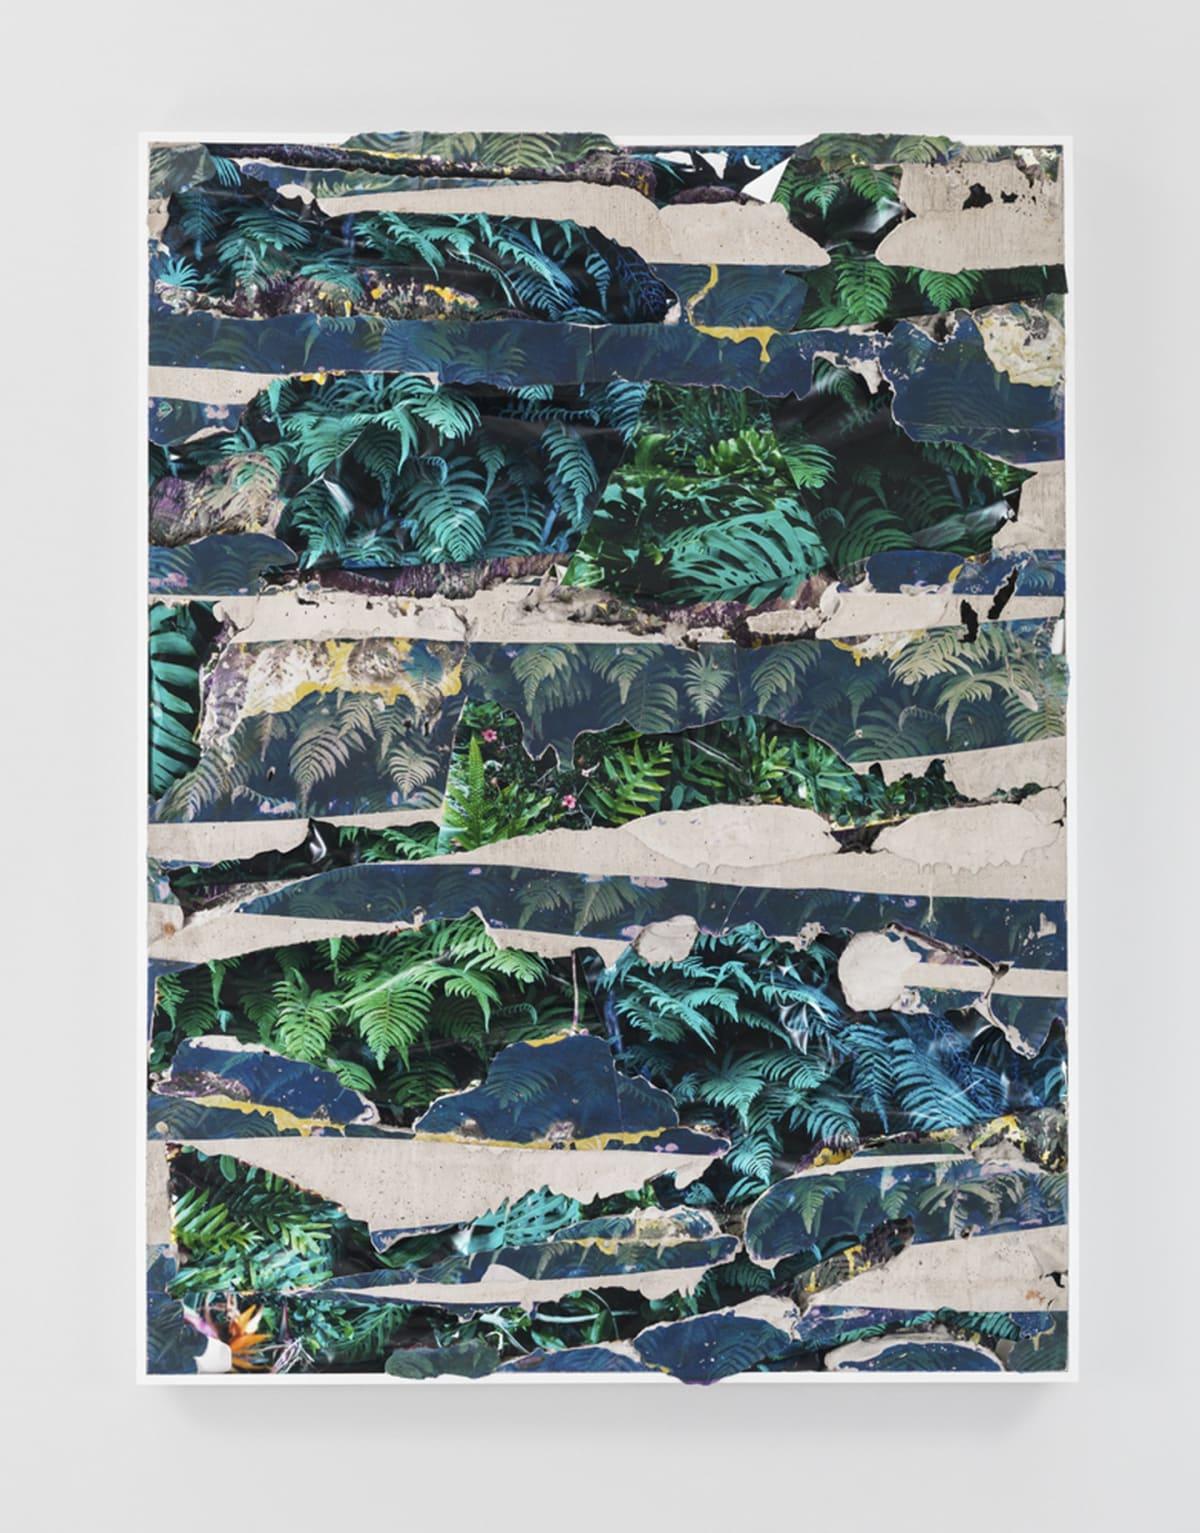 Kauai Green Concrete Bend, 2014 C-prints, emulsion transfer, concrete, aluminum frame 60 1/2 x 45 1/2 x 2 inches Courtesy of Letha Wilson